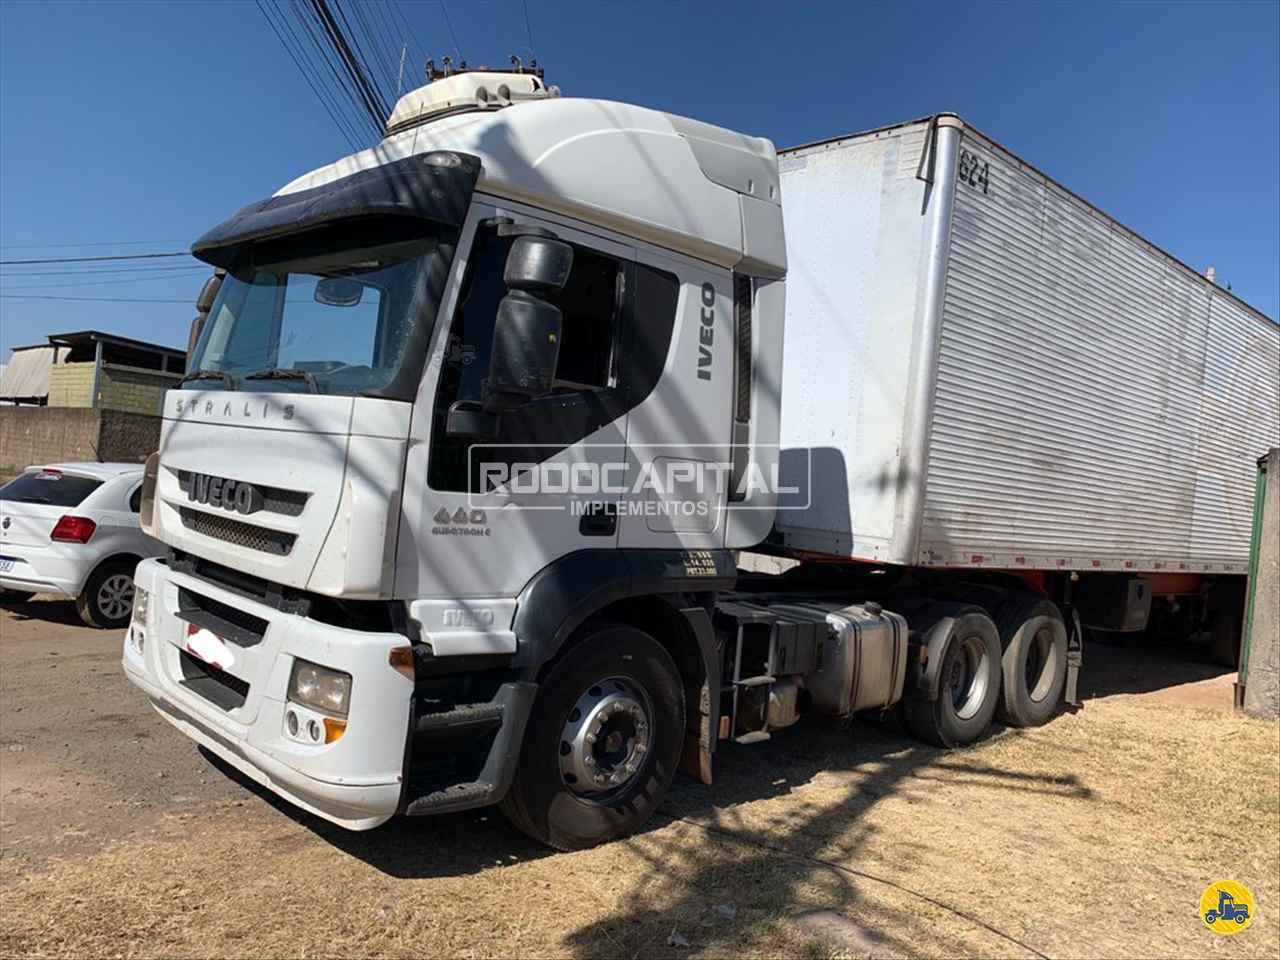 CAMINHAO IVECO STRALIS 440 Cavalo Mecânico Truck 6x2 RODOCAPITAL - TRUCKVAN BRASILIA DISTRITO FEDERAL DF